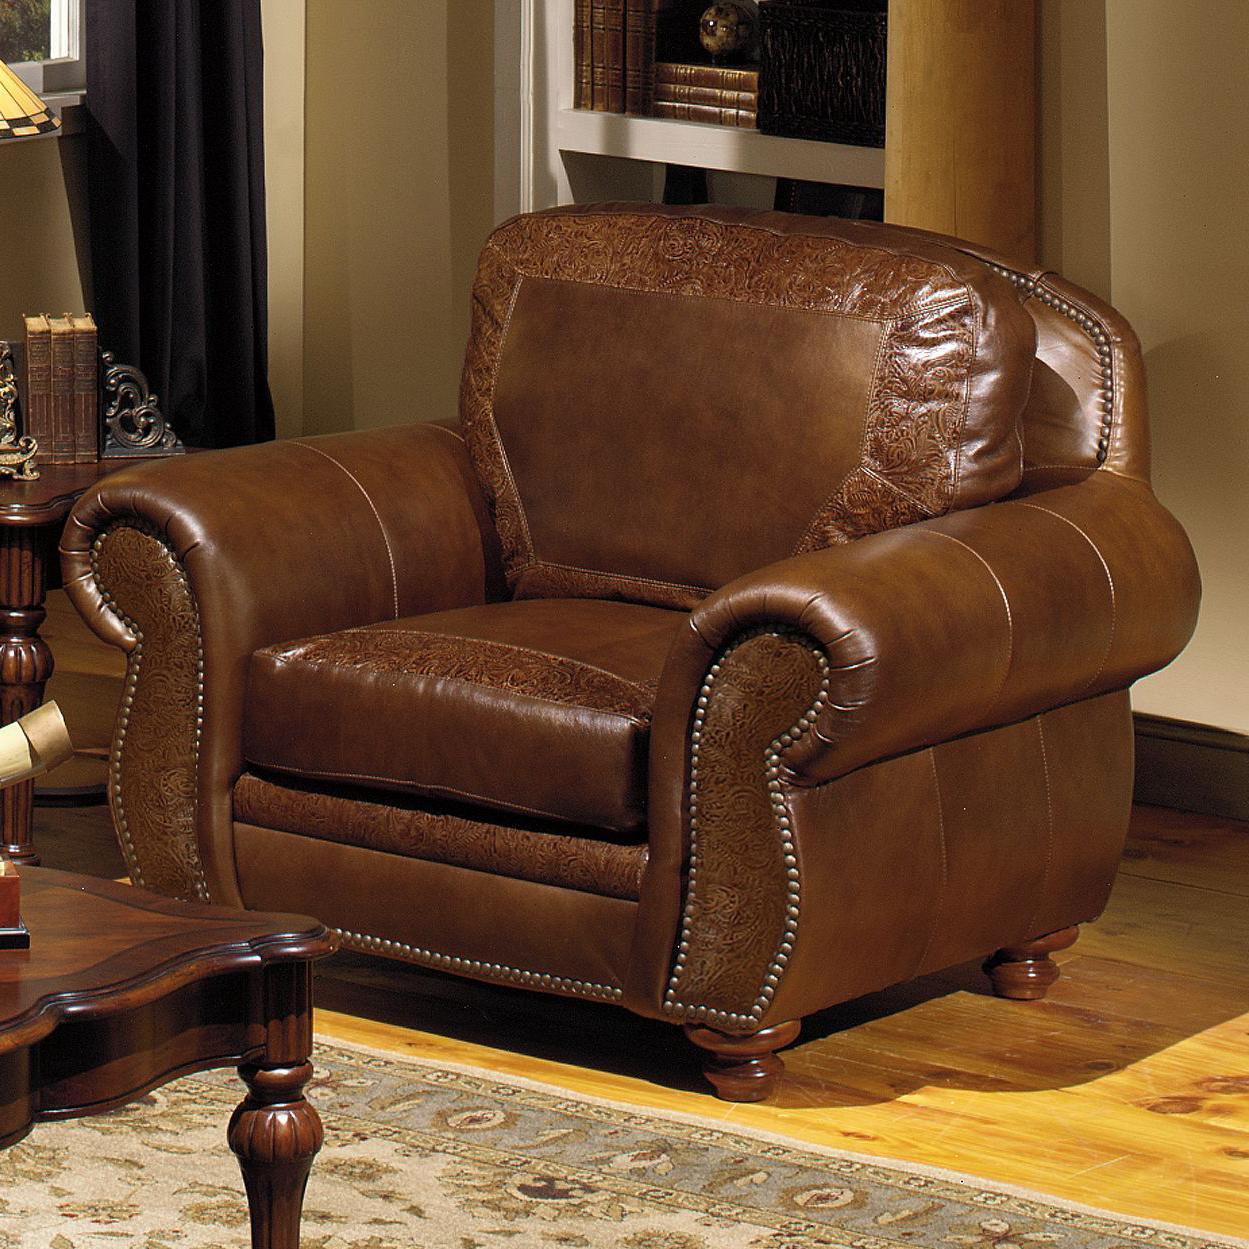 Charmant Olindeu0027s Furniture